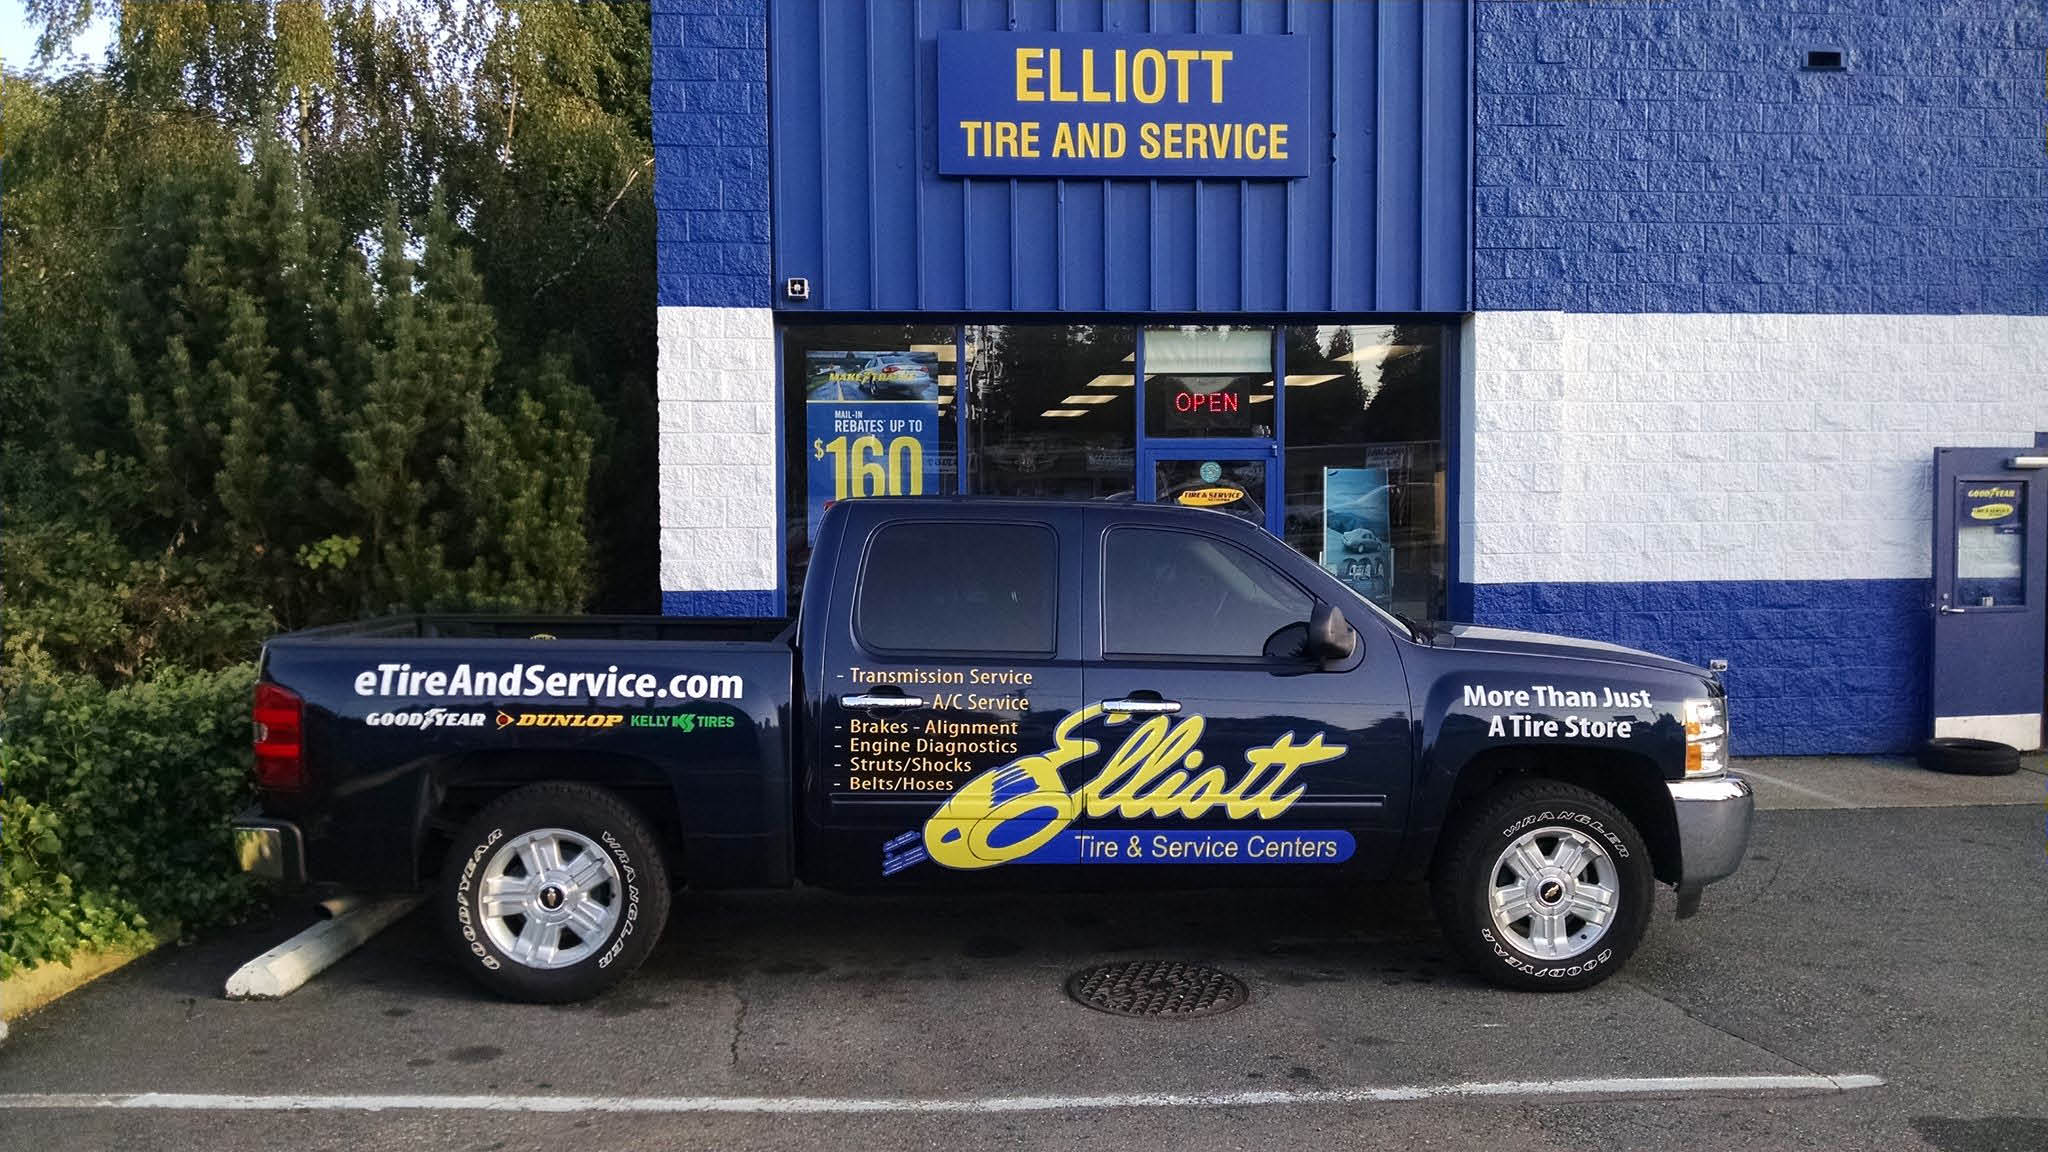 Elliott Tire & Service Centers employ the best car mechanics to provide excellent customer service